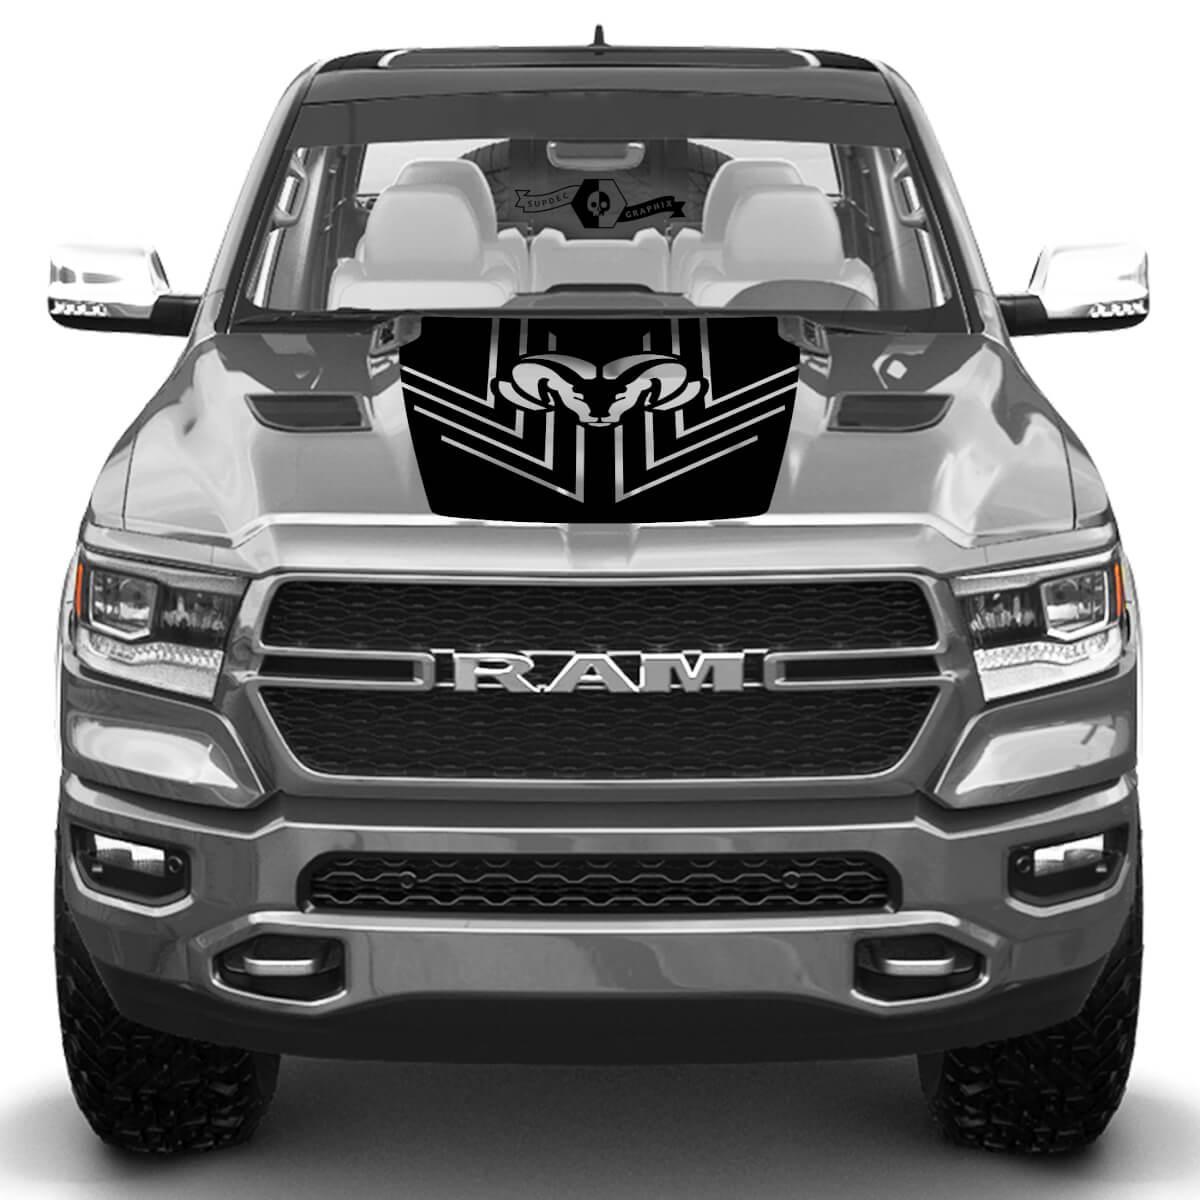 New Hood Dodge Ram Head Rebel Pfeil Line Truck Vinyl Aufkleber Grafik